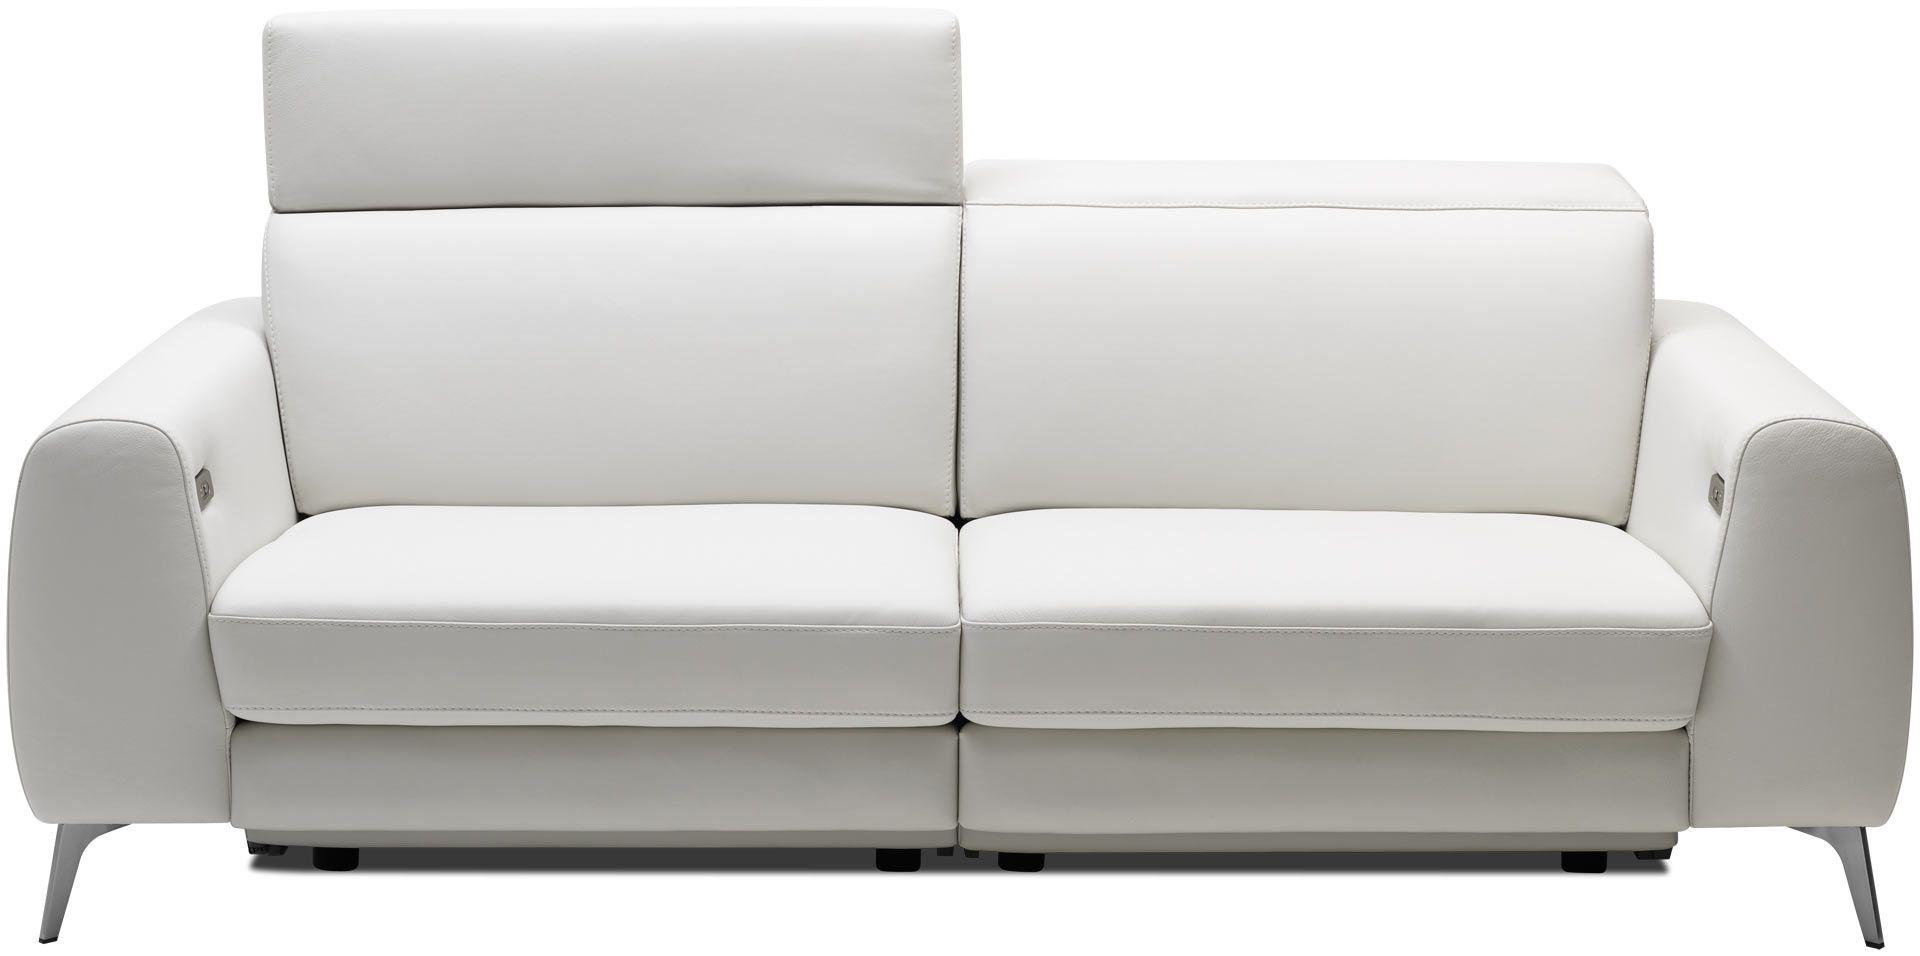 Modern Madison recliner sofas - Quality from BoConcept | Modern ...